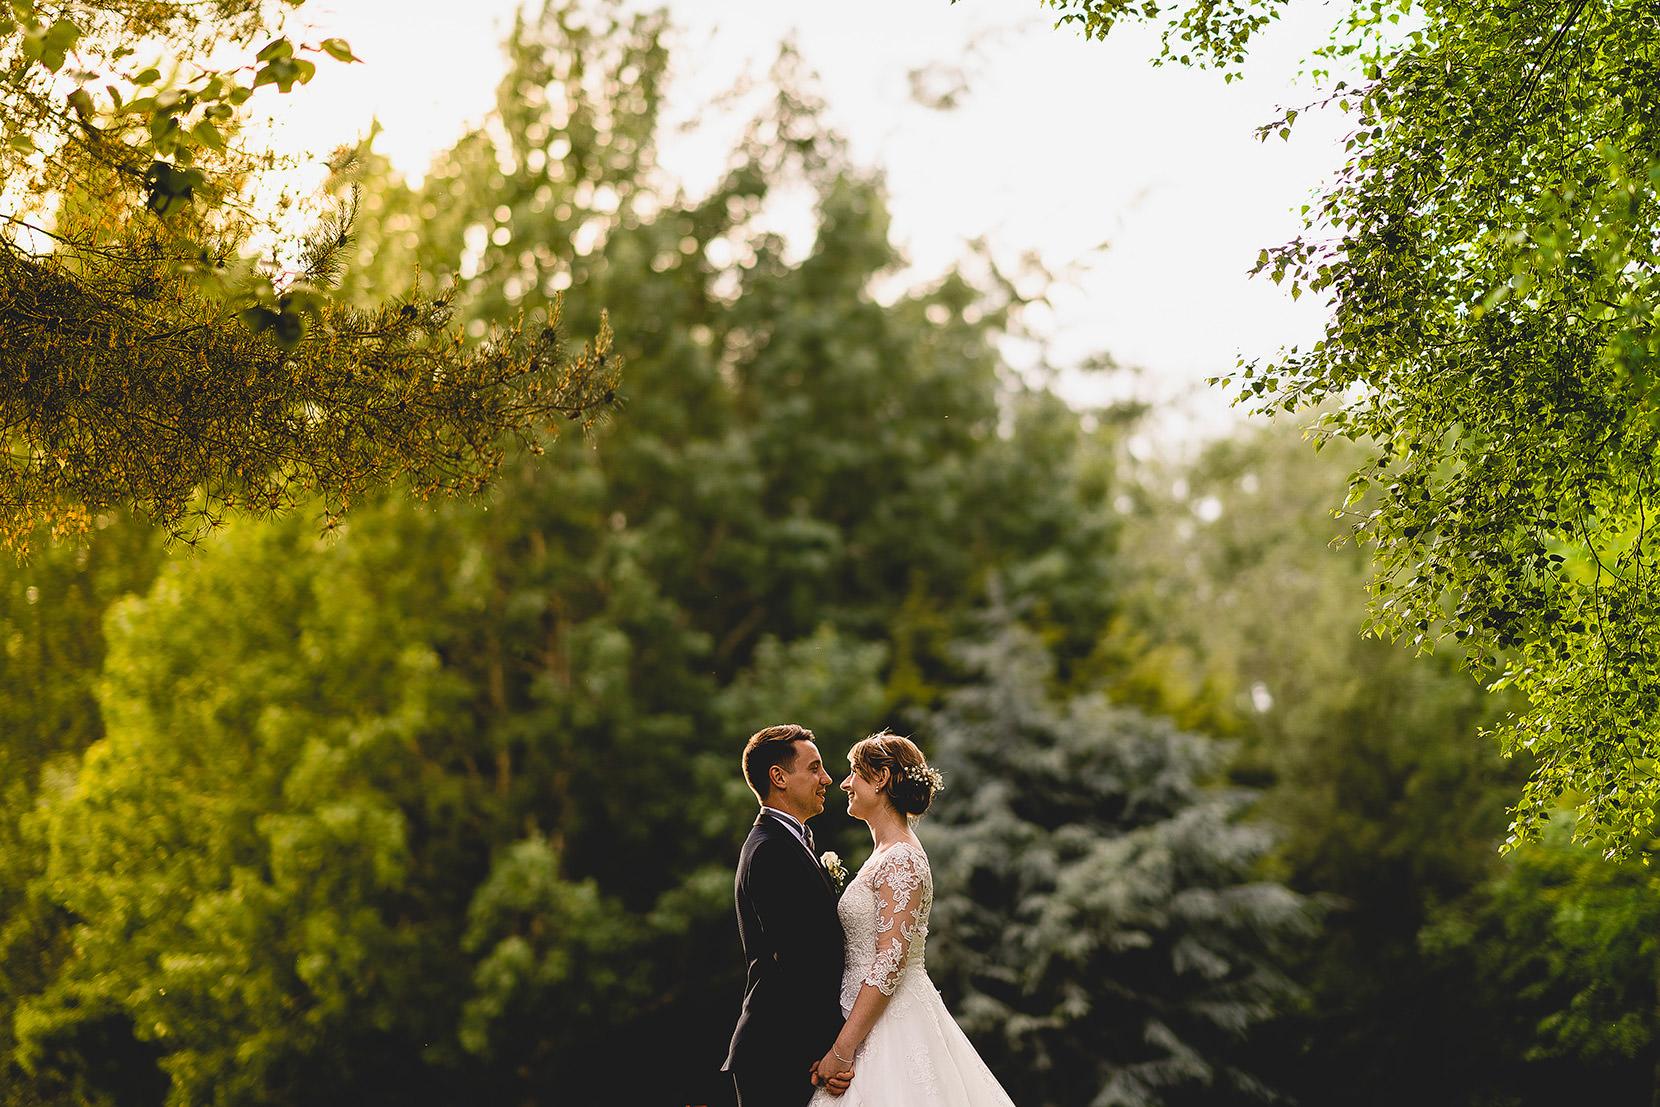 Andrew & Samatha's wedding photographs at Rookery park